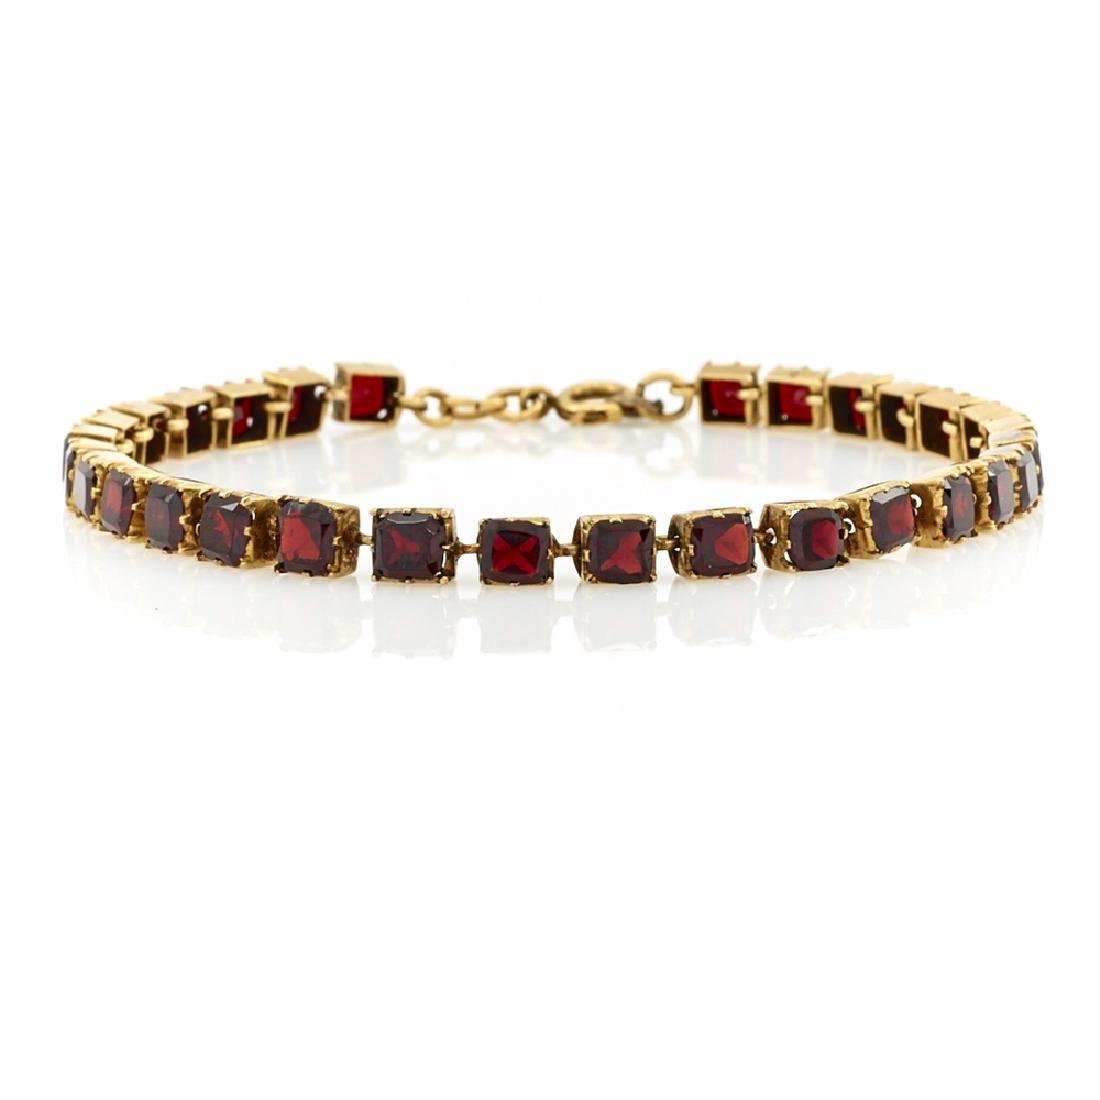 9K Yellow gold & garnet Victorian bracelet